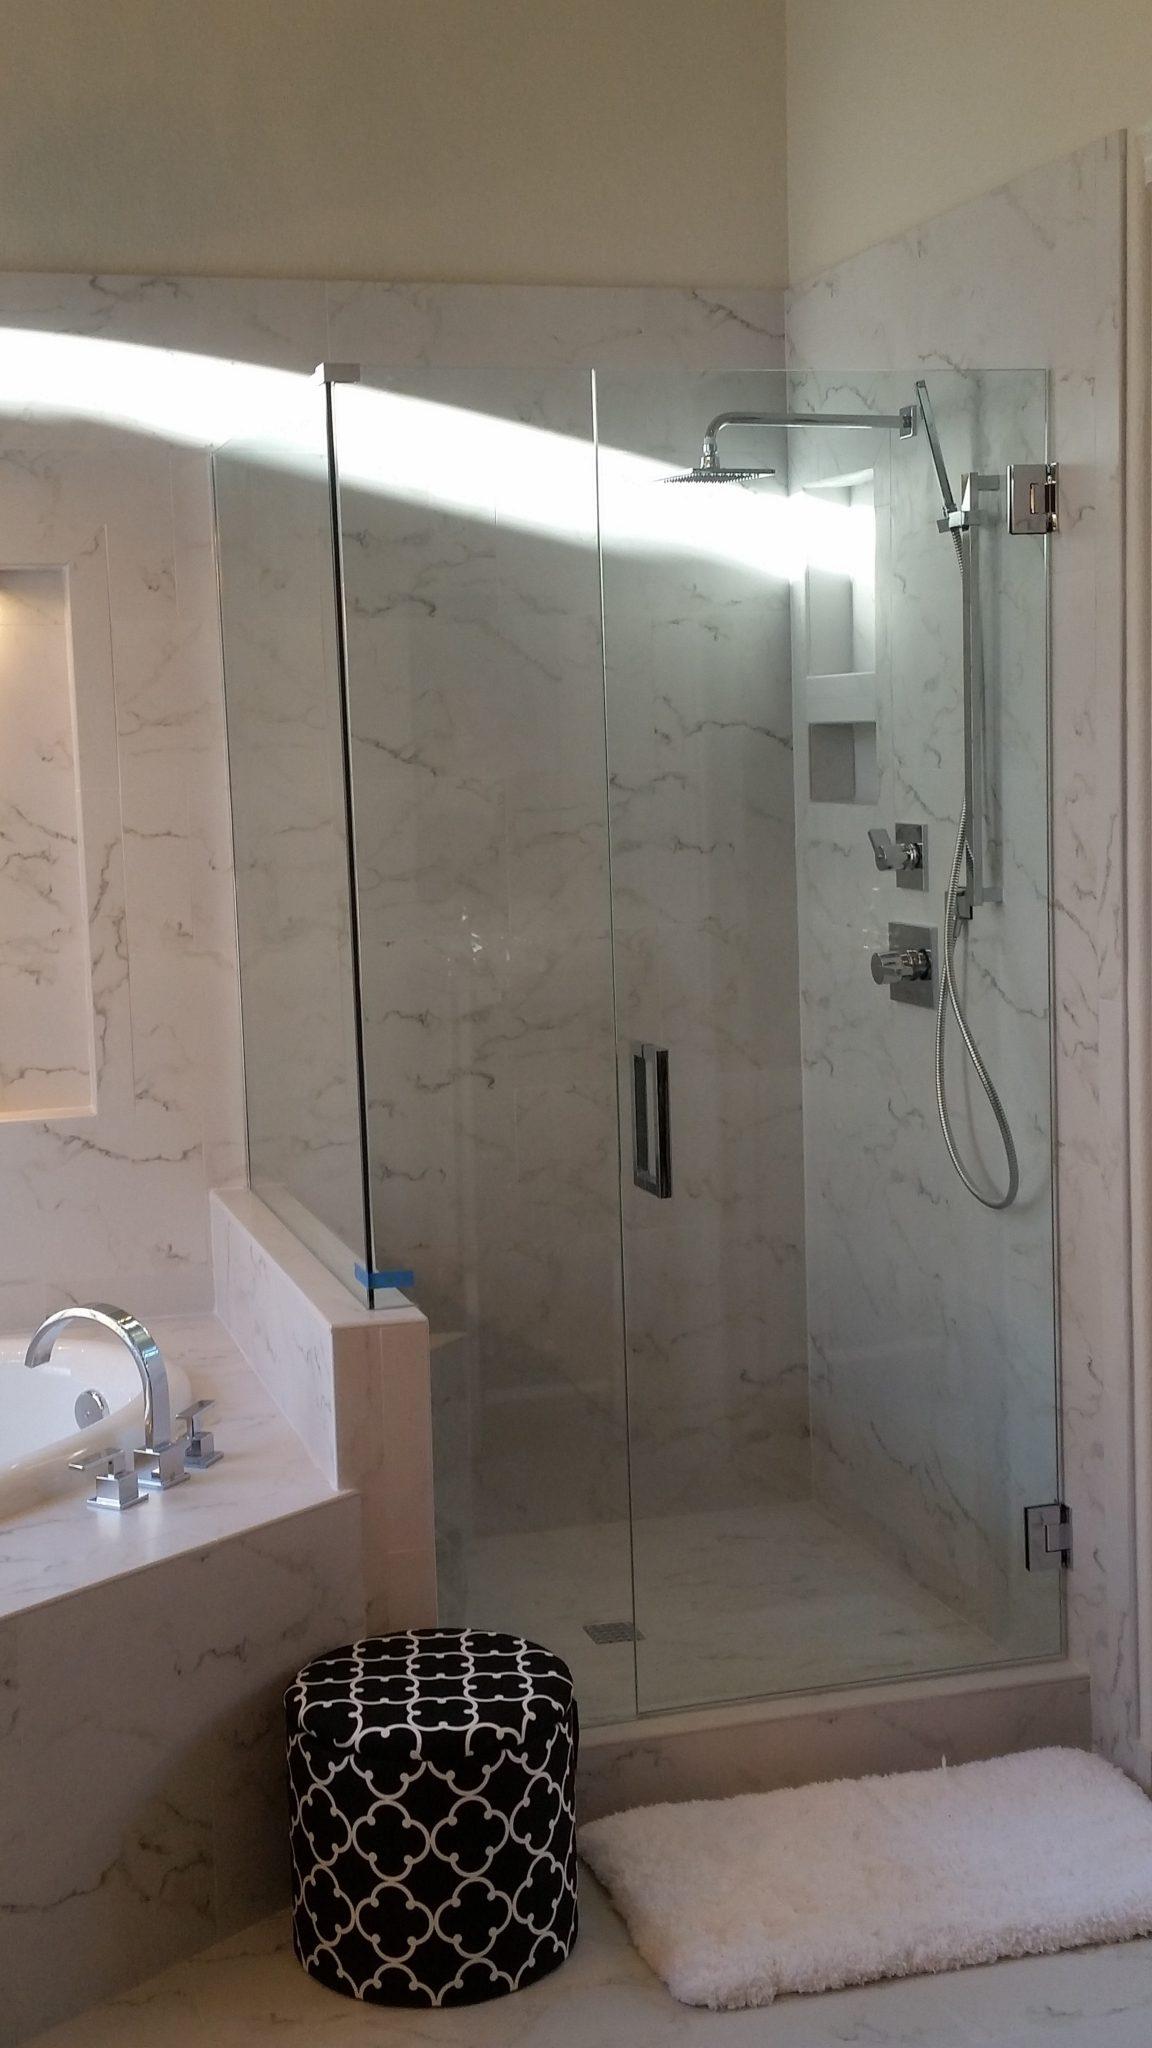 Arizona Tub Shower Combination | A Cut Above Glass